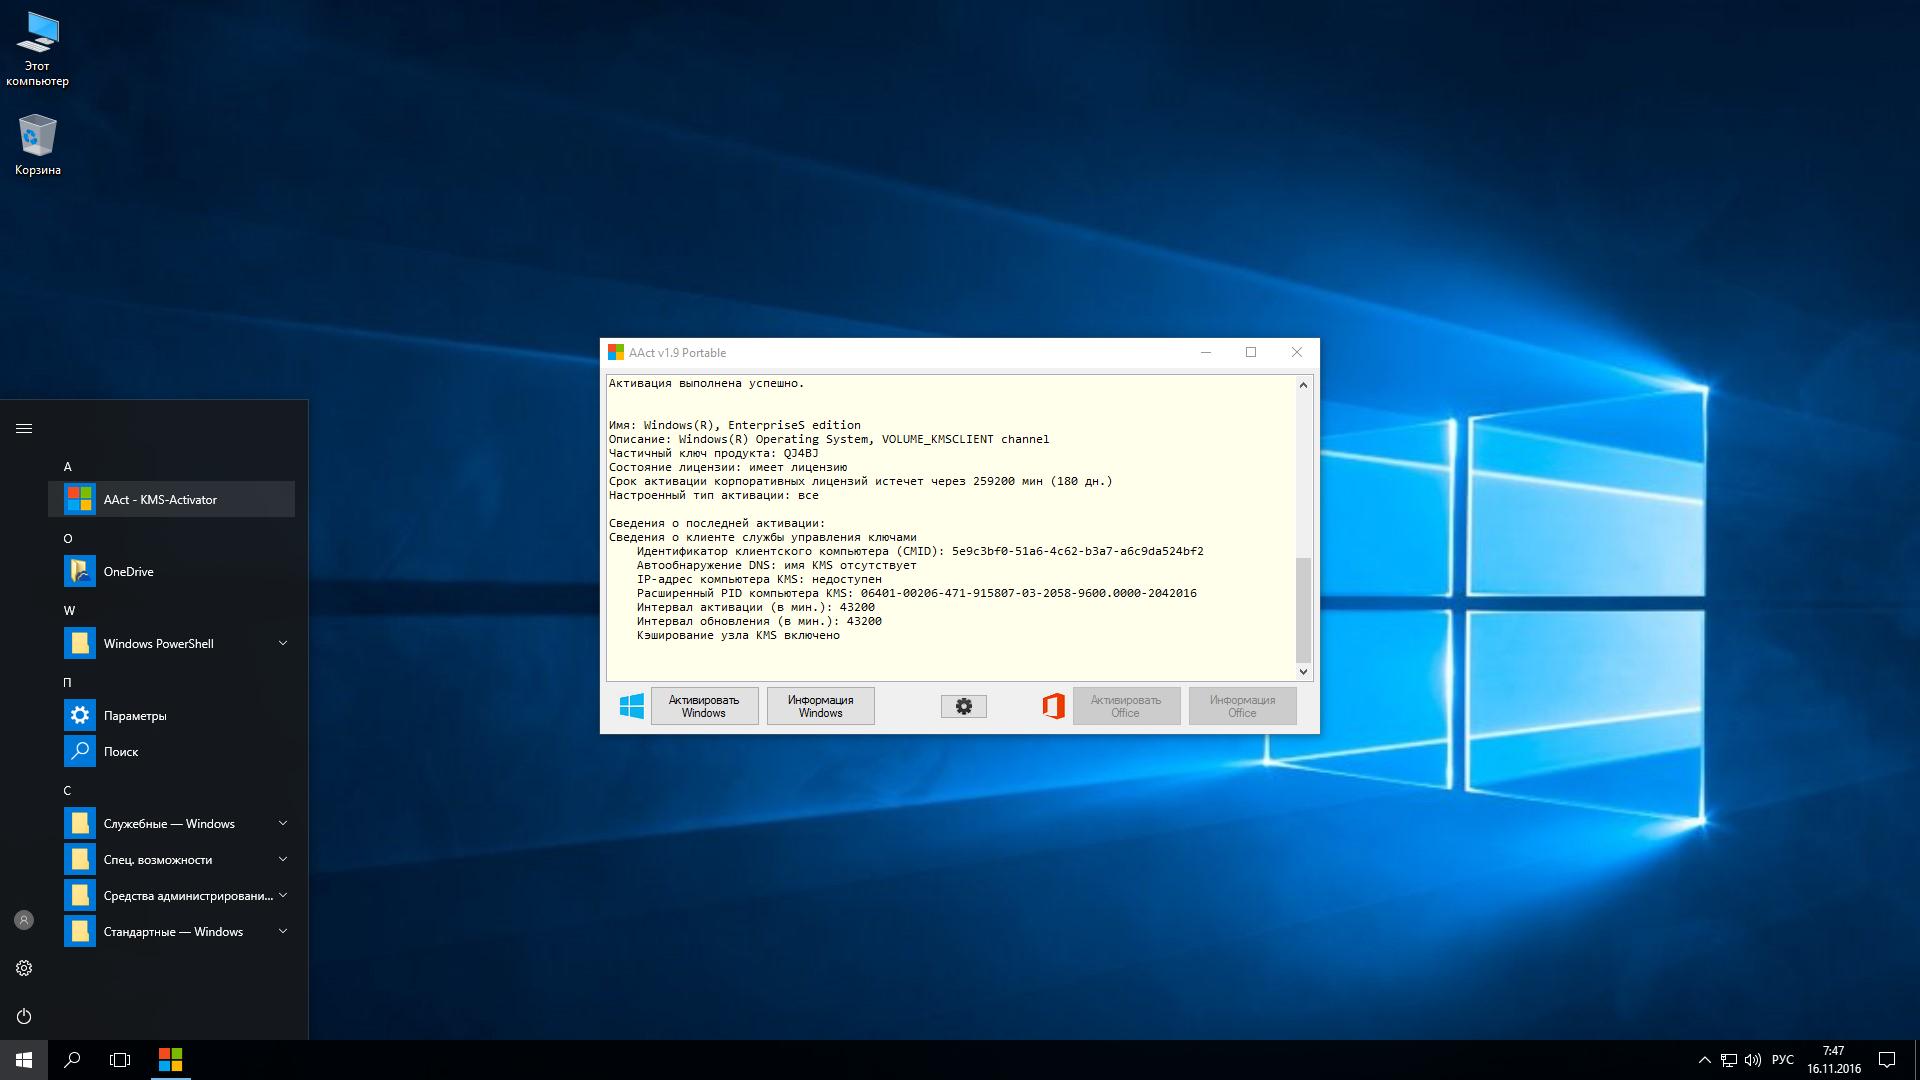 Windows 10 Enterprise 2015 LTSB x64 DVD Russian